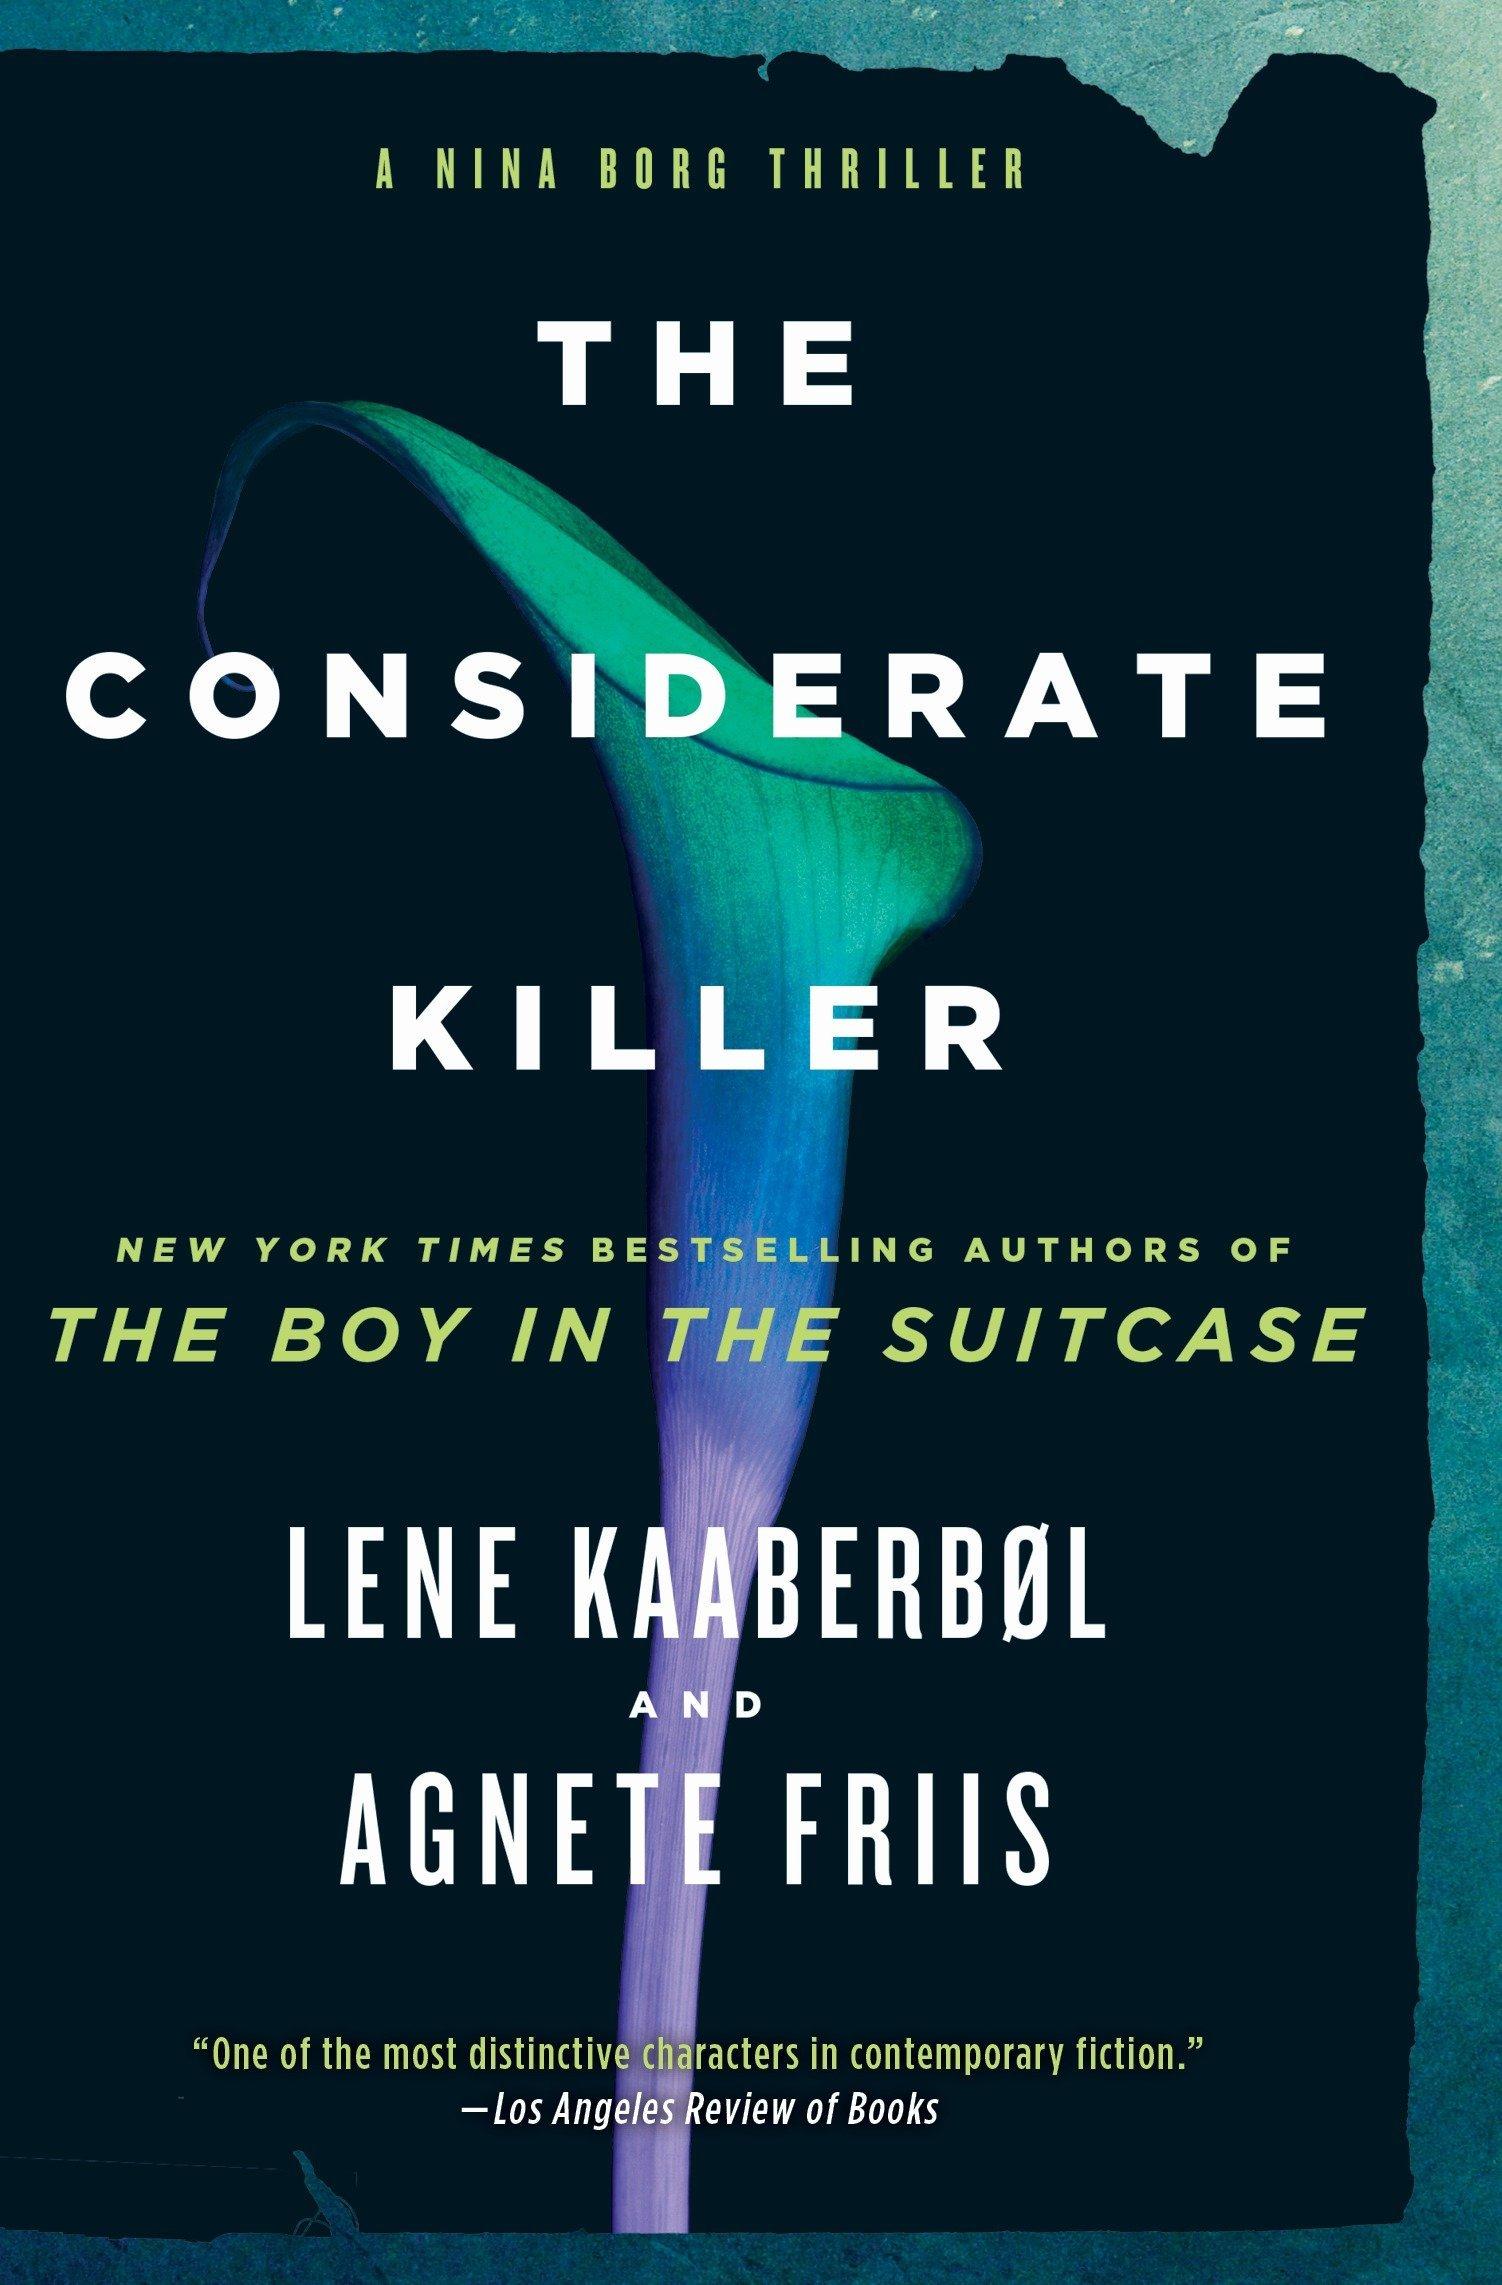 The Considerate Killer (A Nina Borg Novel) pdf epub